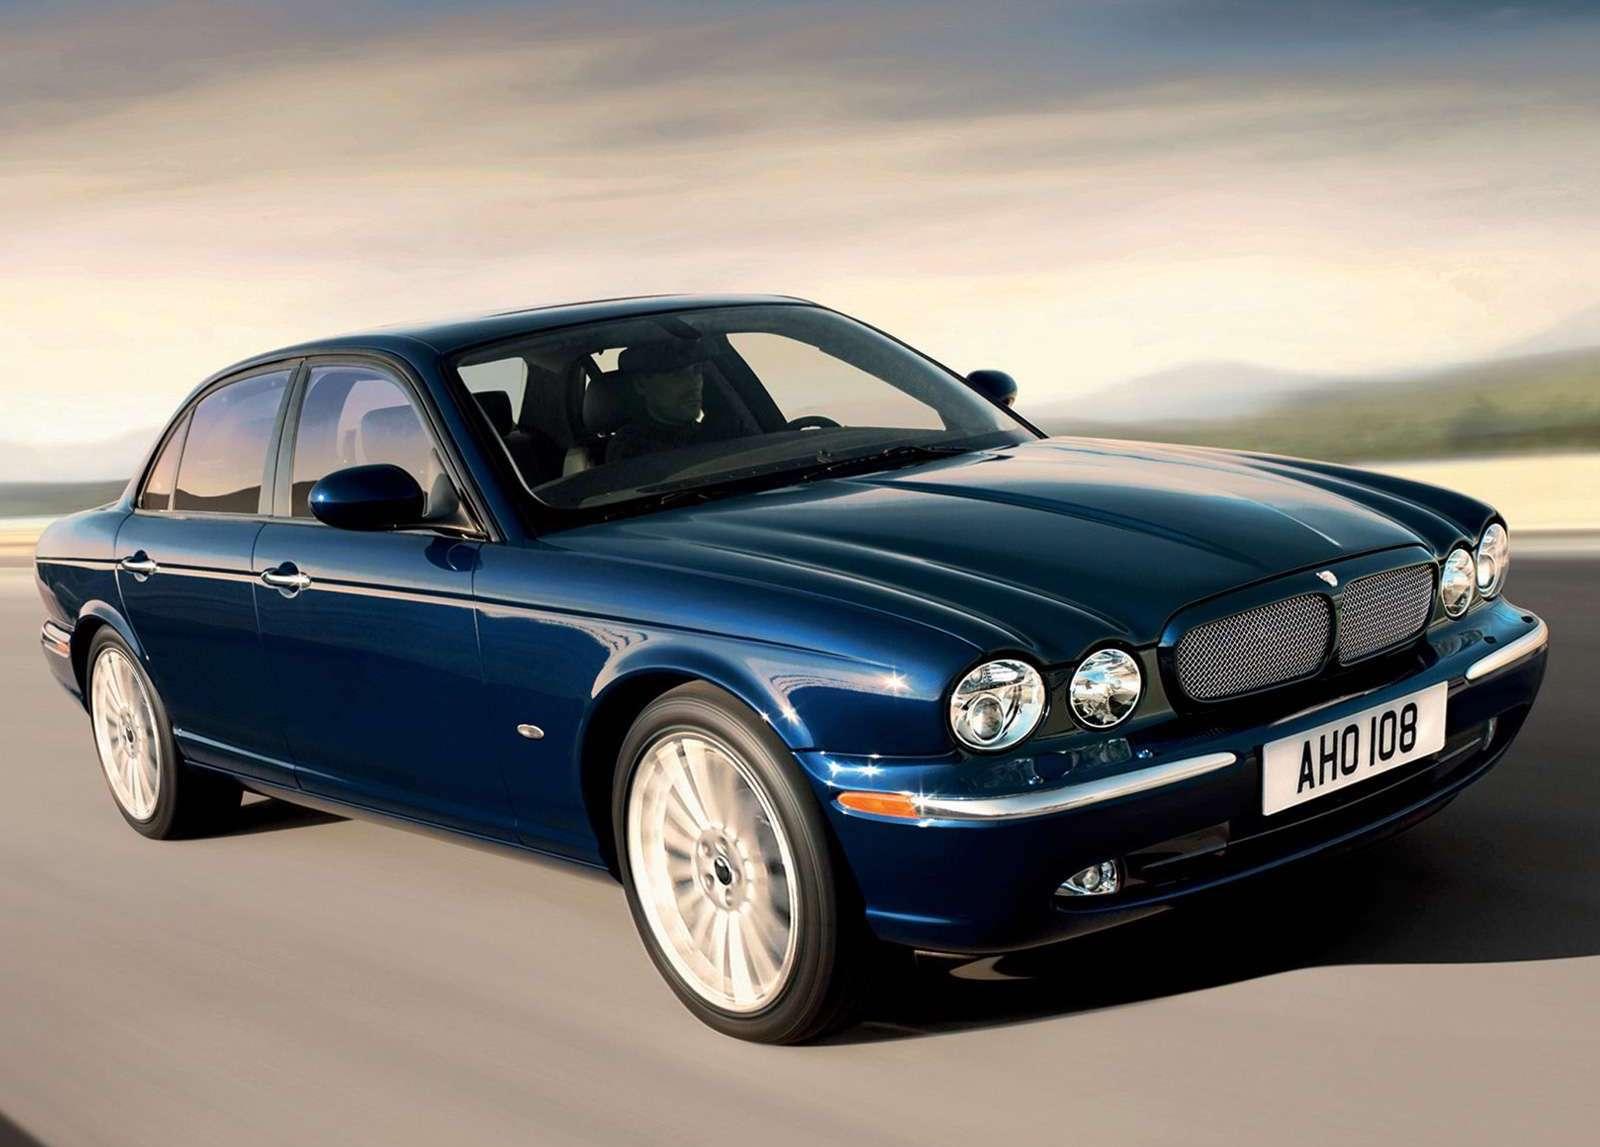 2006 Jaguar XJ aluminum body structure